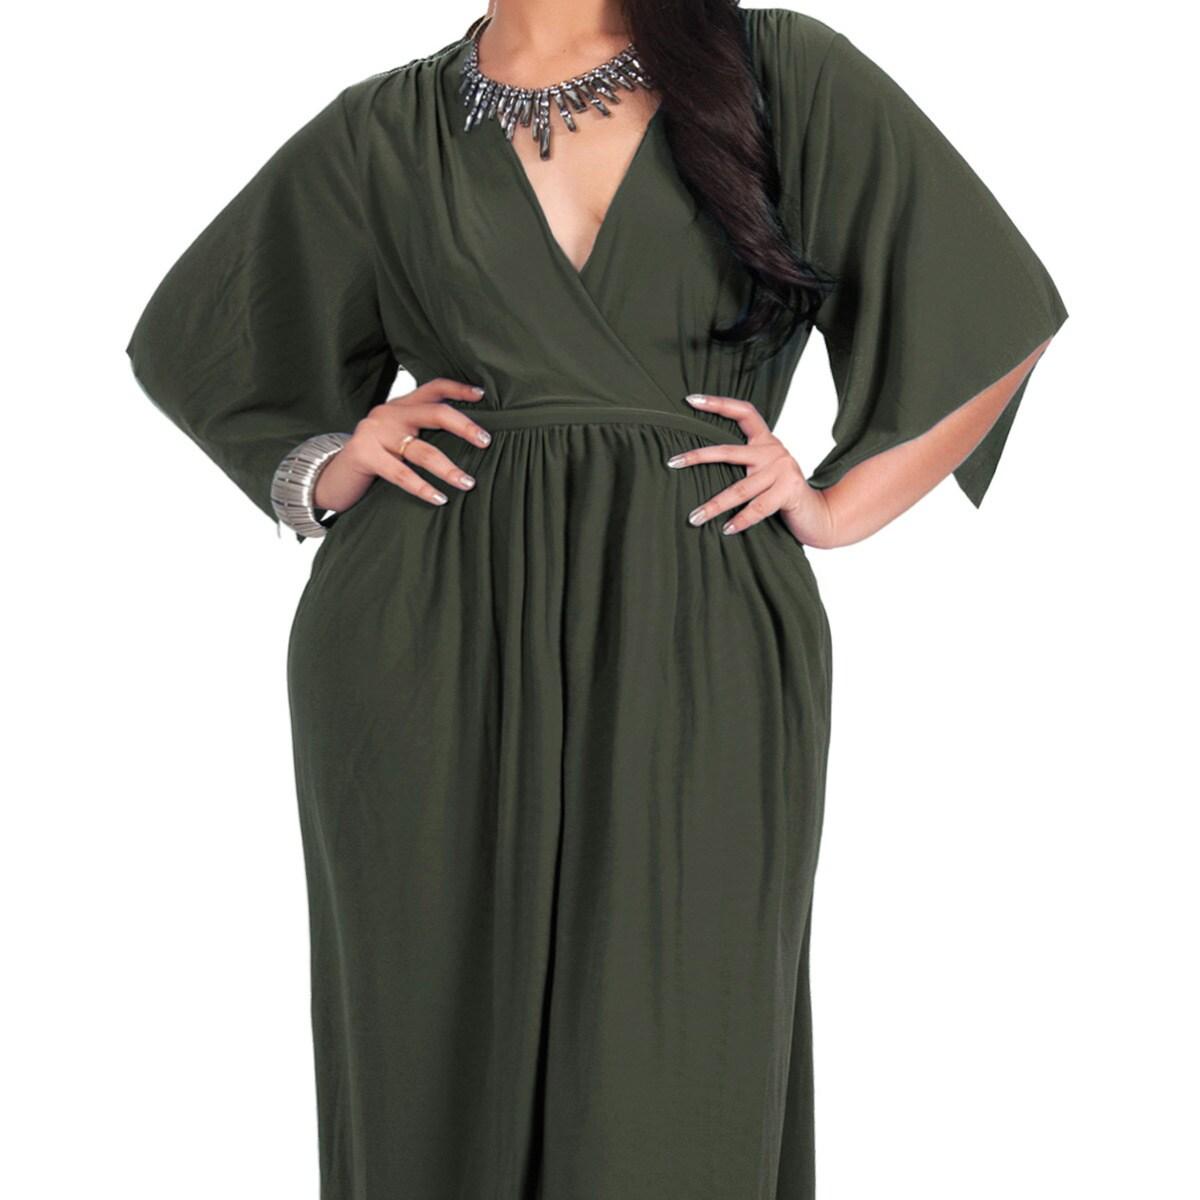 Shop Koh Koh Women\'s Plus Size Empire Waist Maxi Dress - Free ...